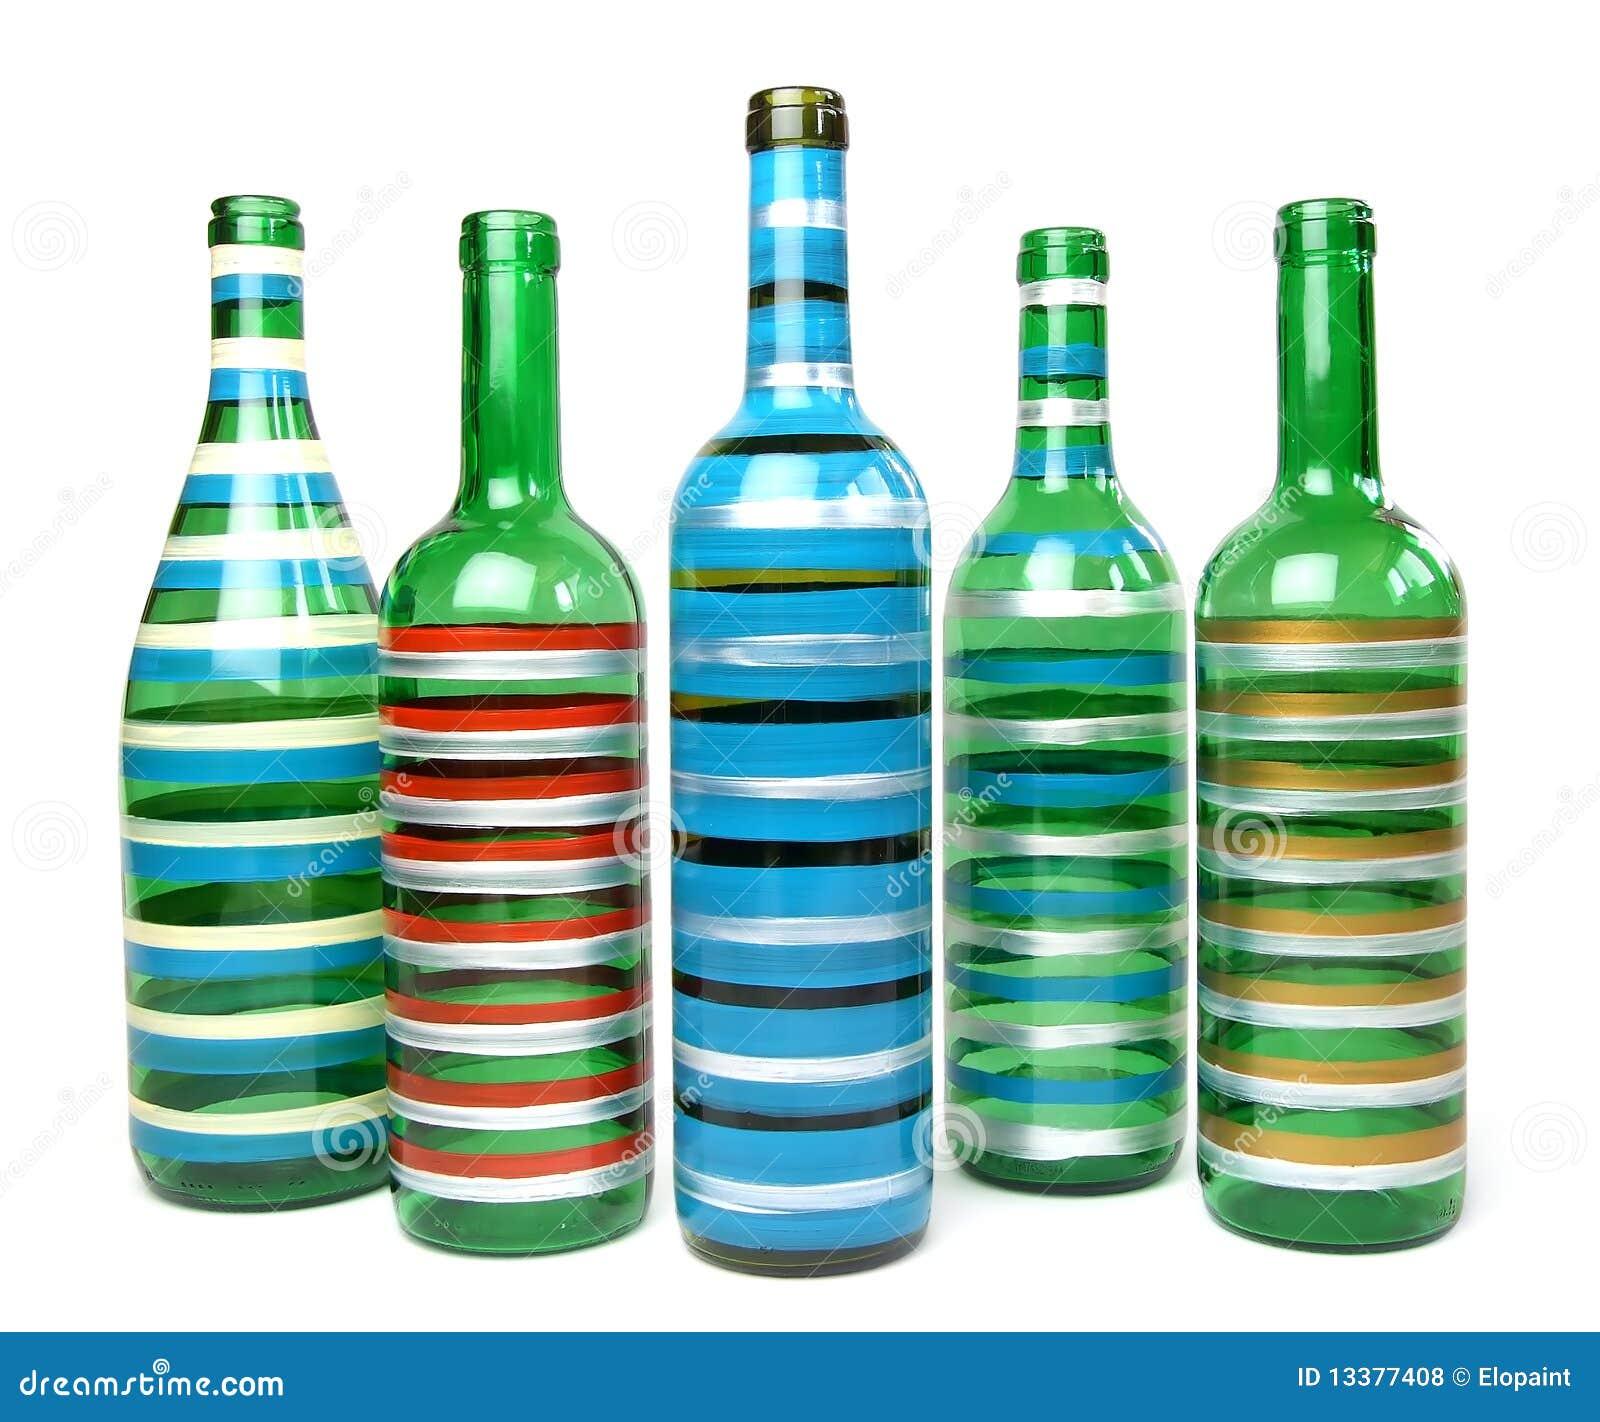 Decorative Glass Bottles Royalty Free Stock Photos Image 13377408